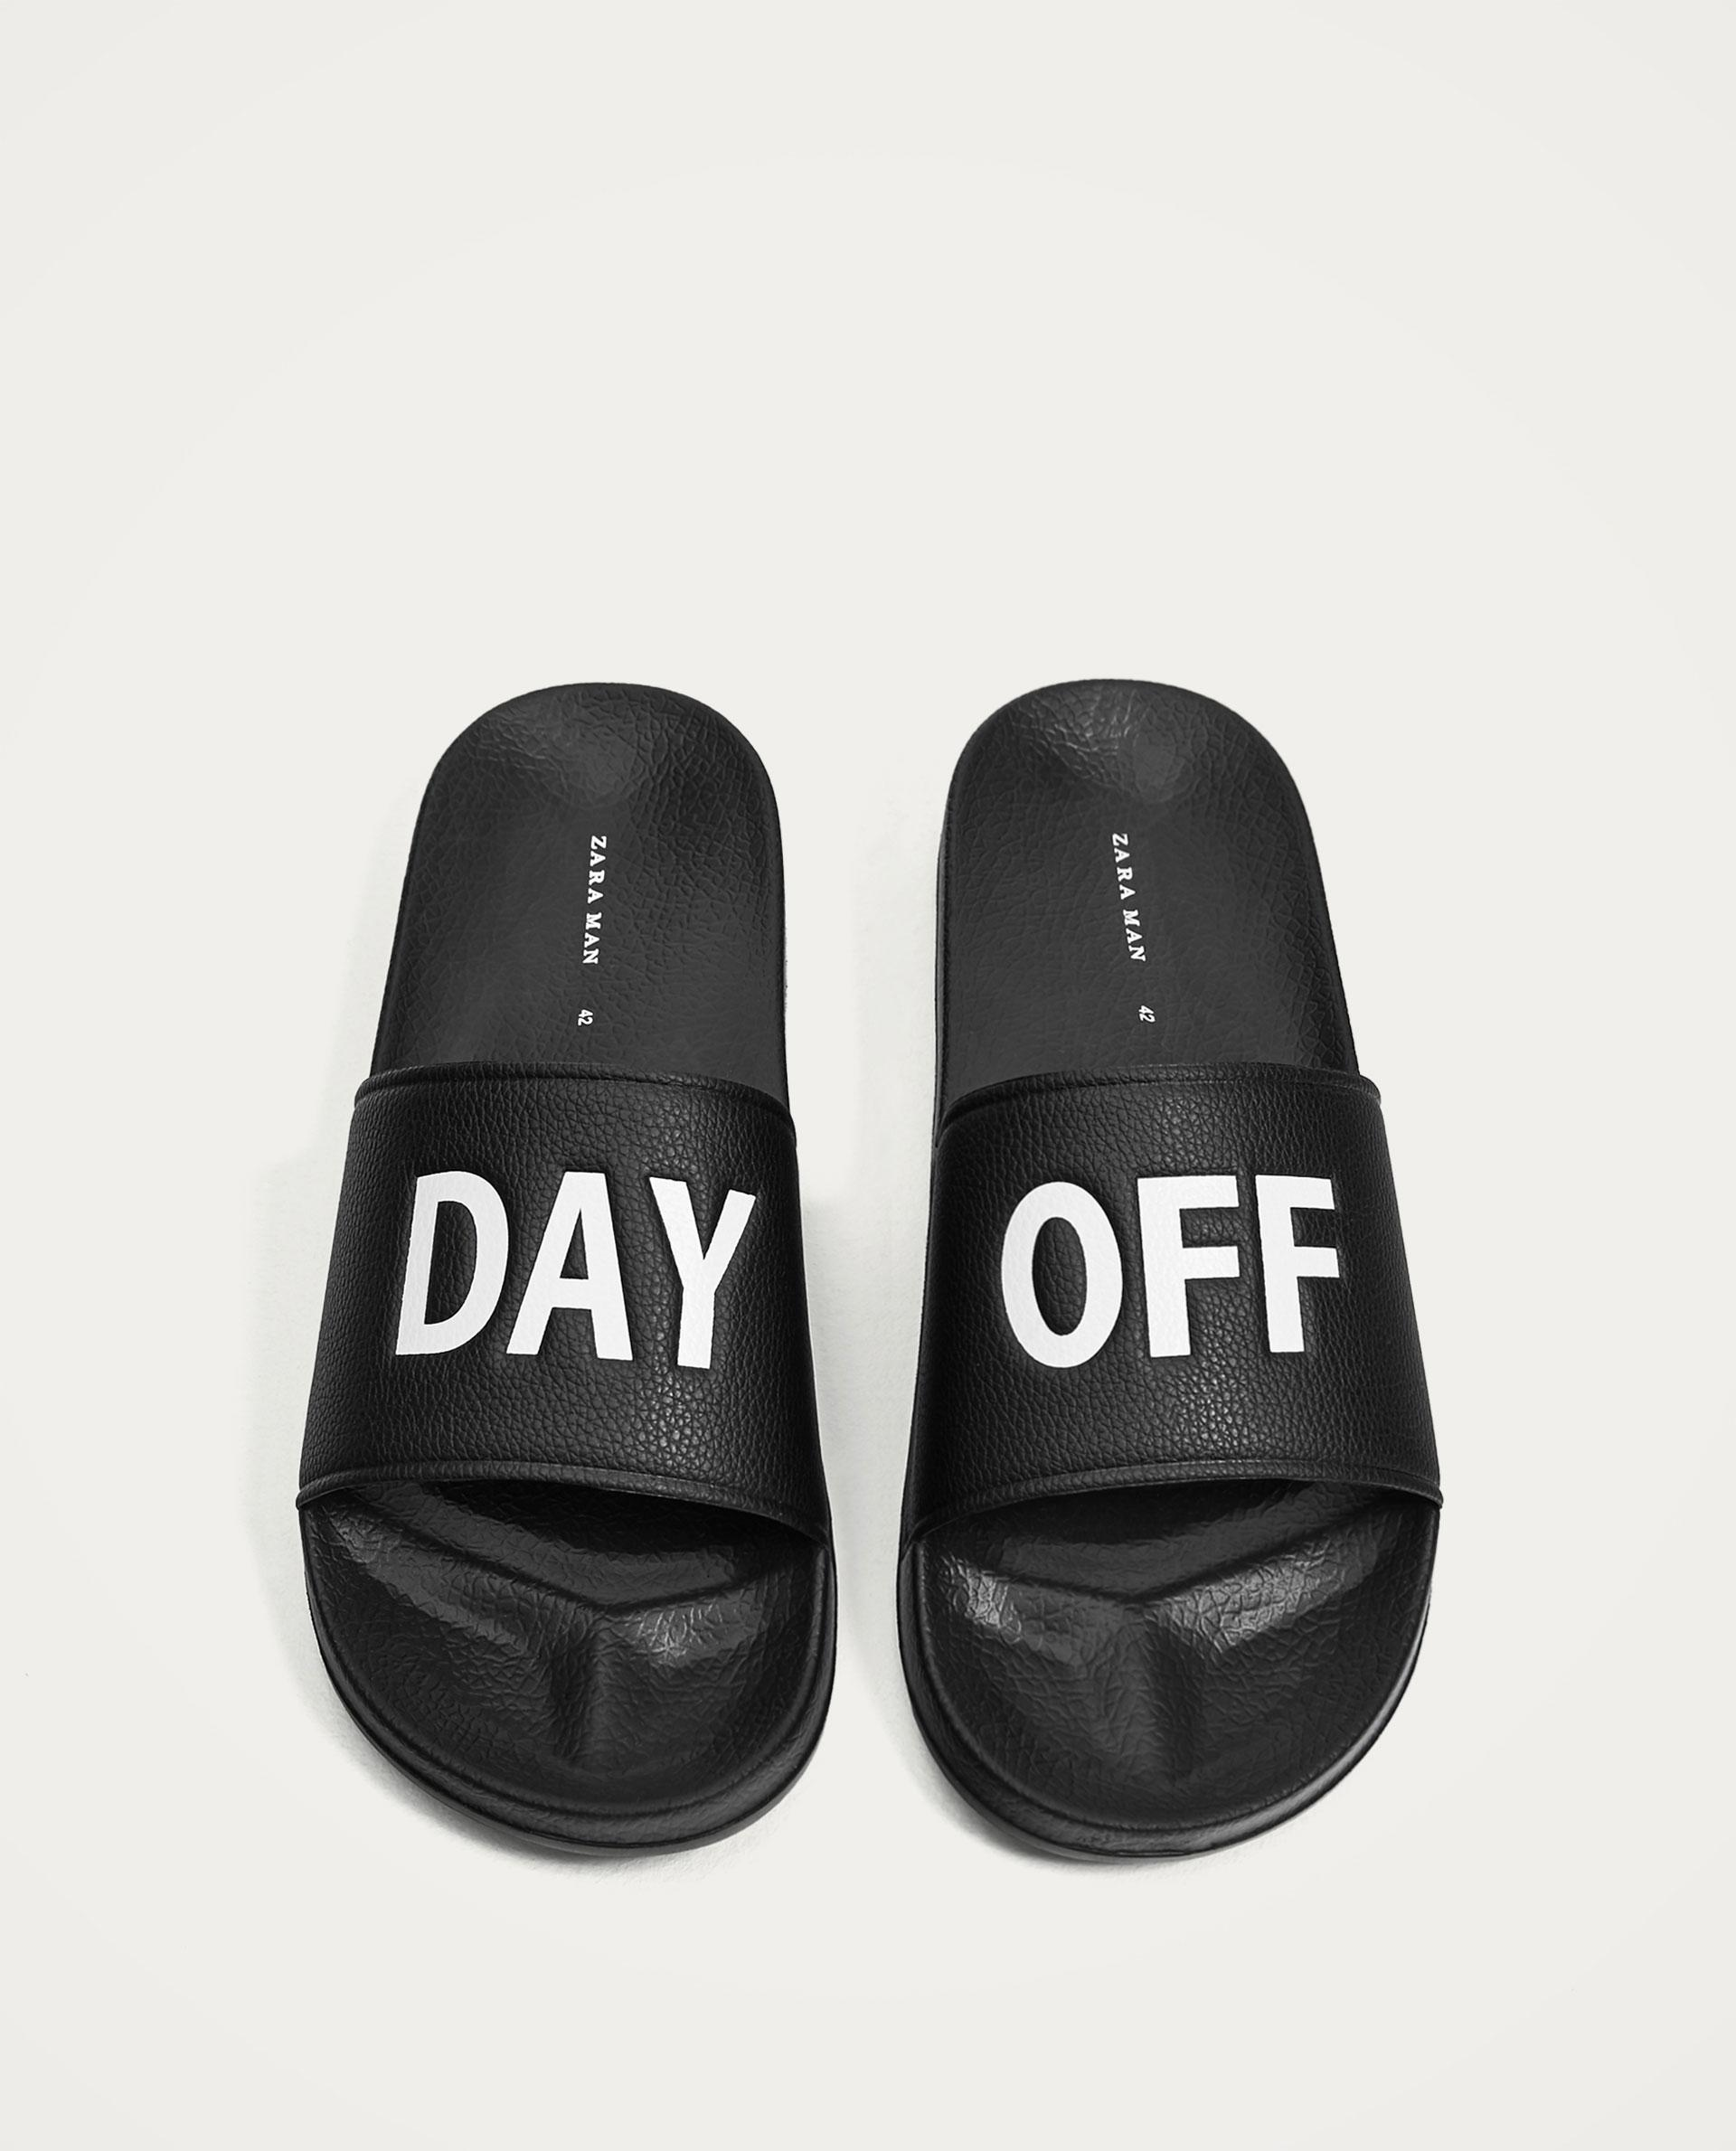 Buy Zara Shoes Uk